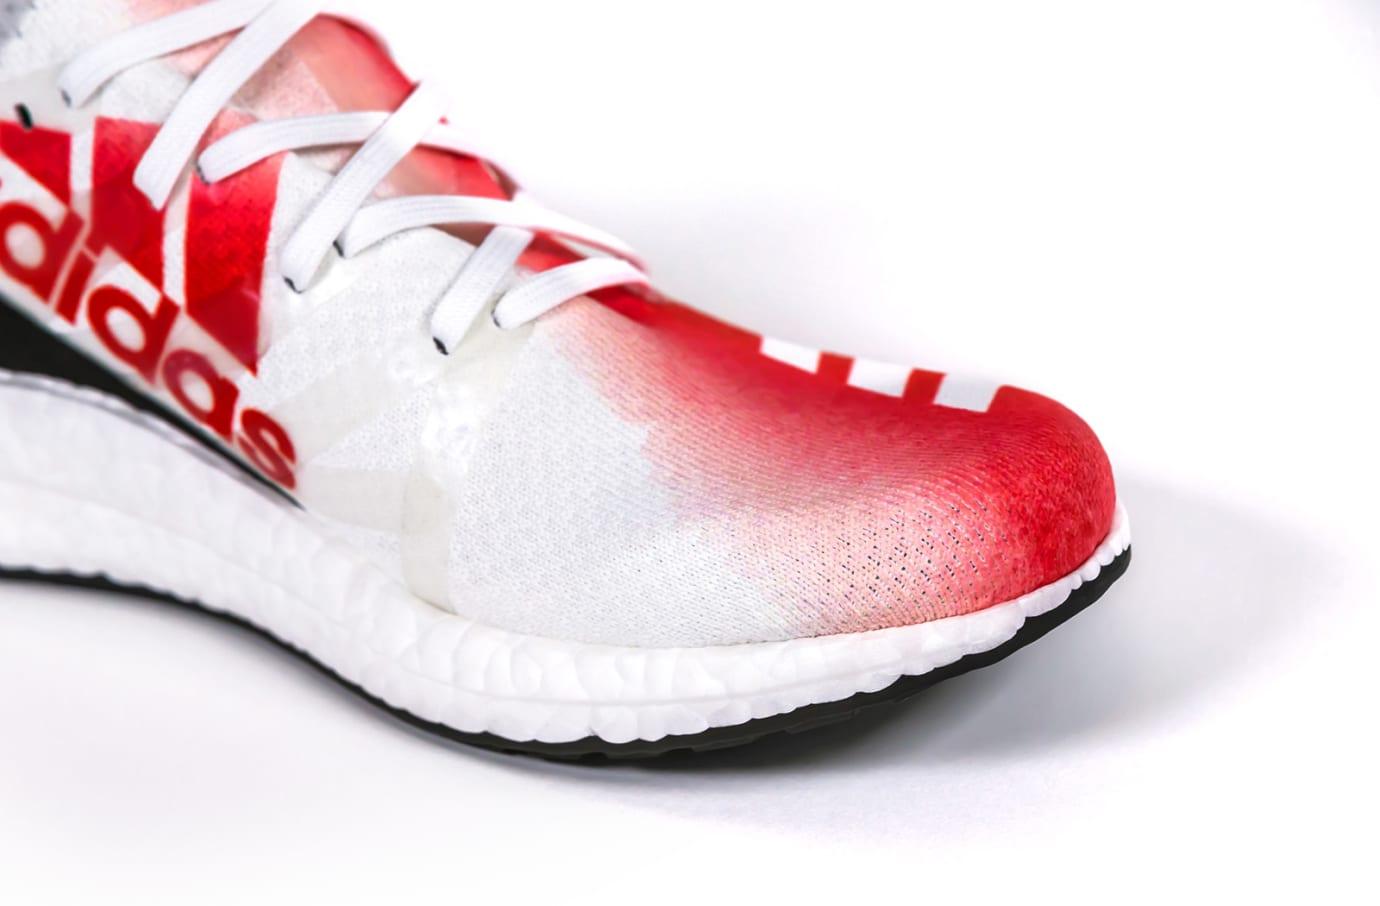 Adidas Speedfactory AM4BSBL 2